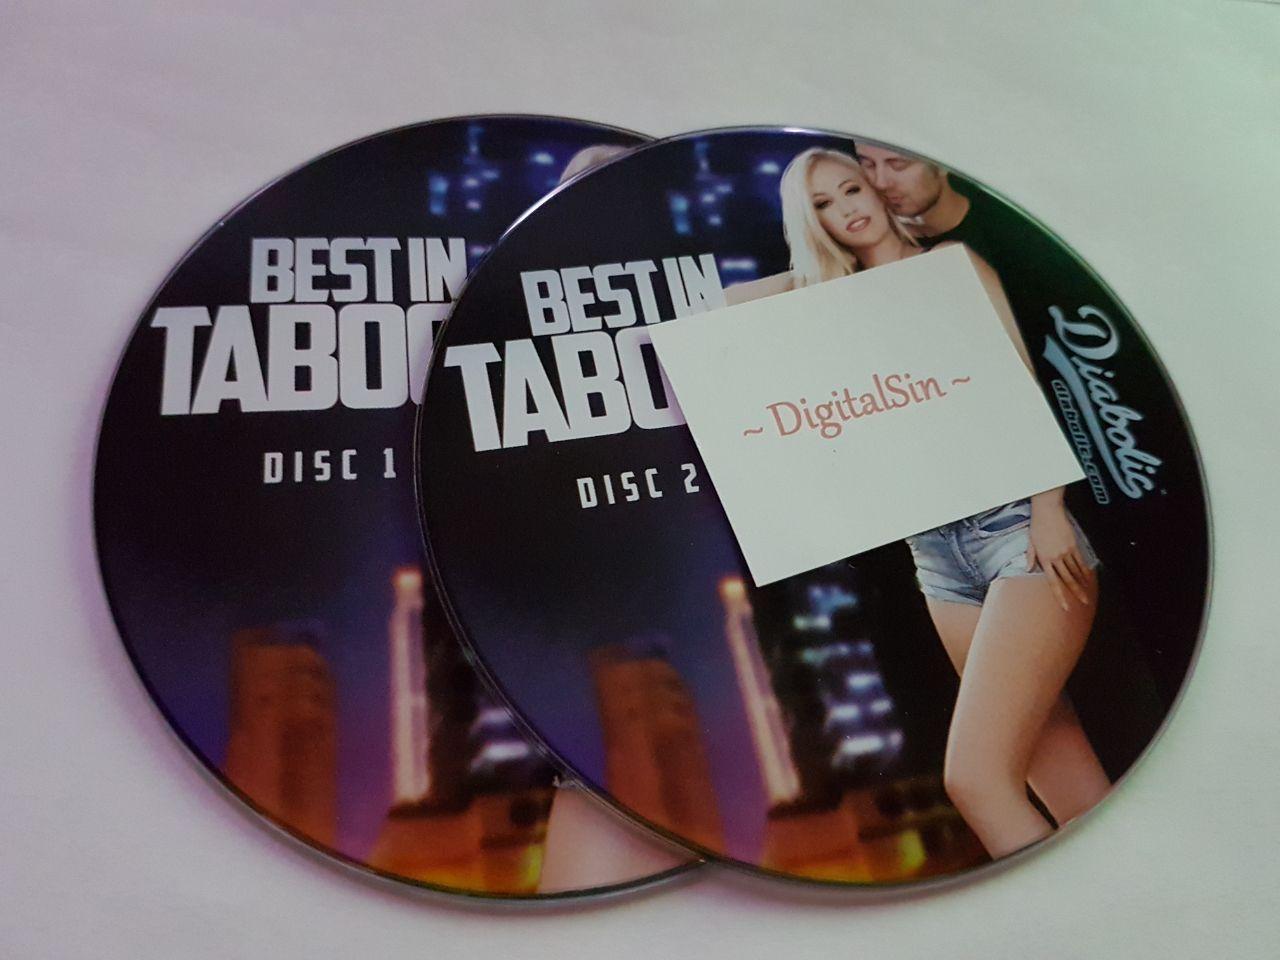 Best In Taboo DiSC2 XXX DVDRip x264-DigitalSin